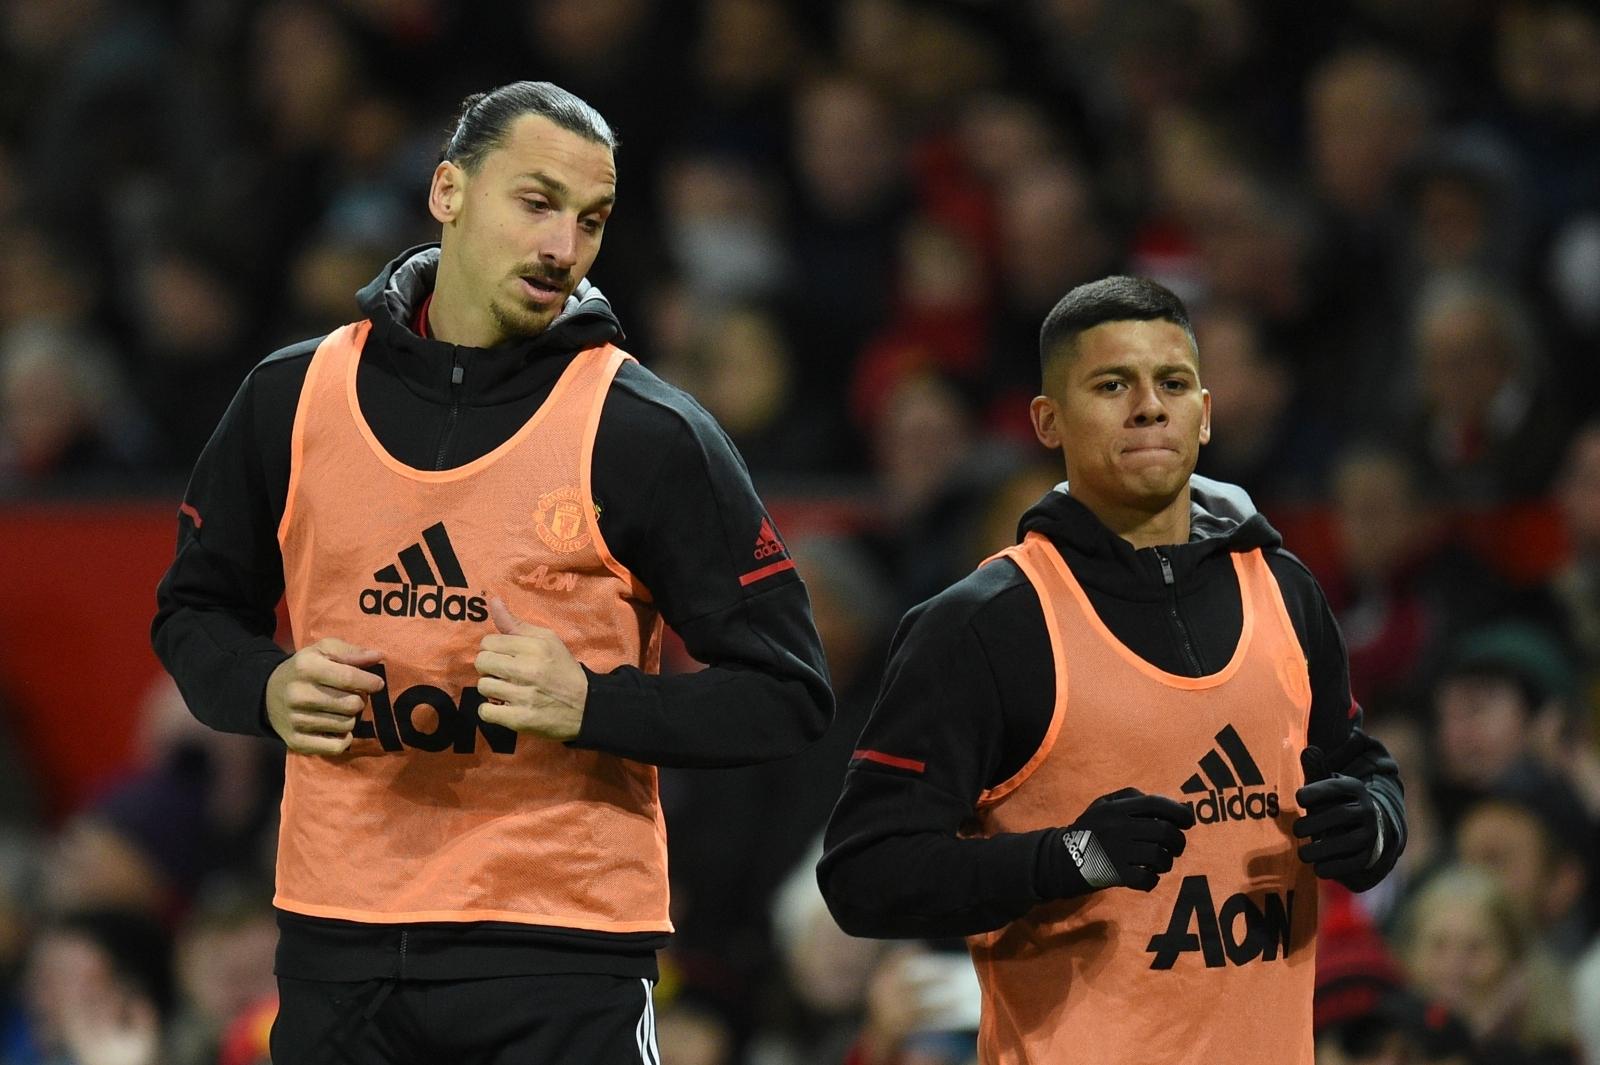 Jose Mourinho: 'Difficult to manage Paul Pogba injury'